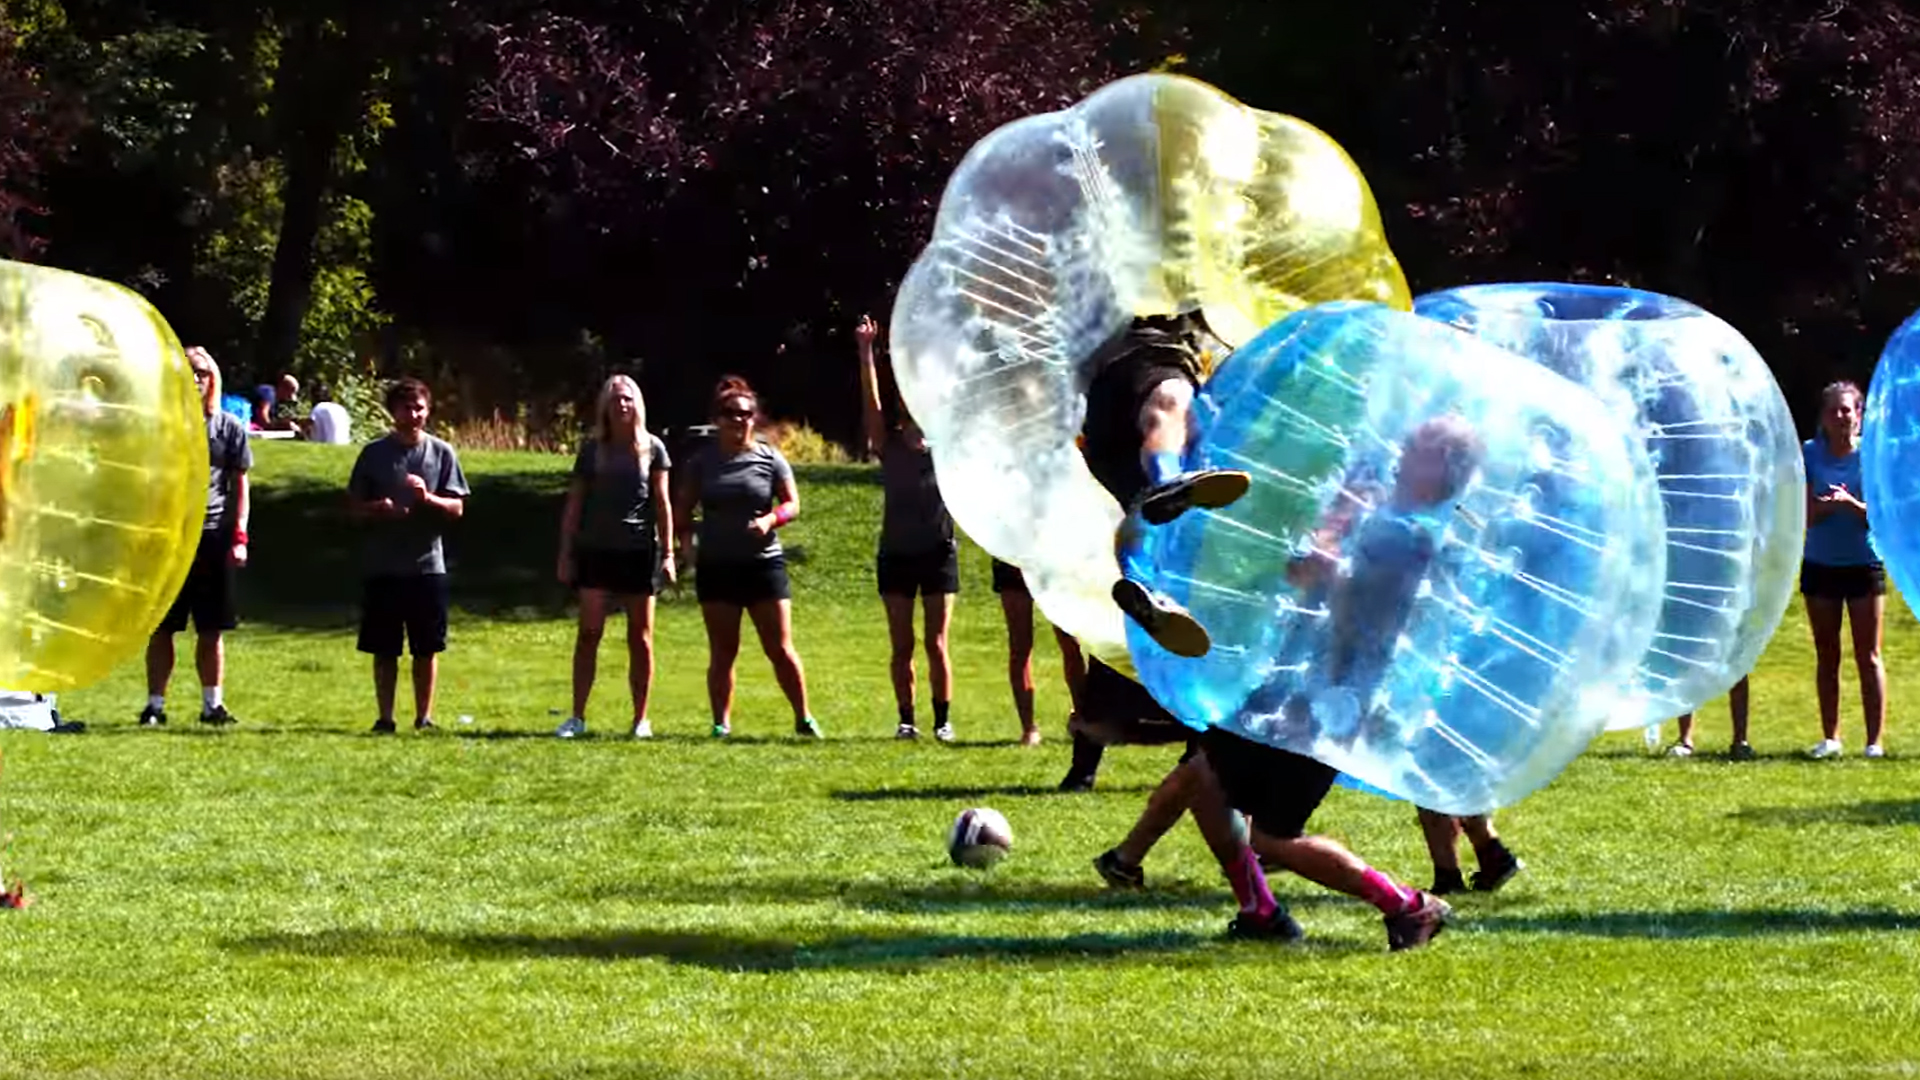 Speedlink Bubble Soccer